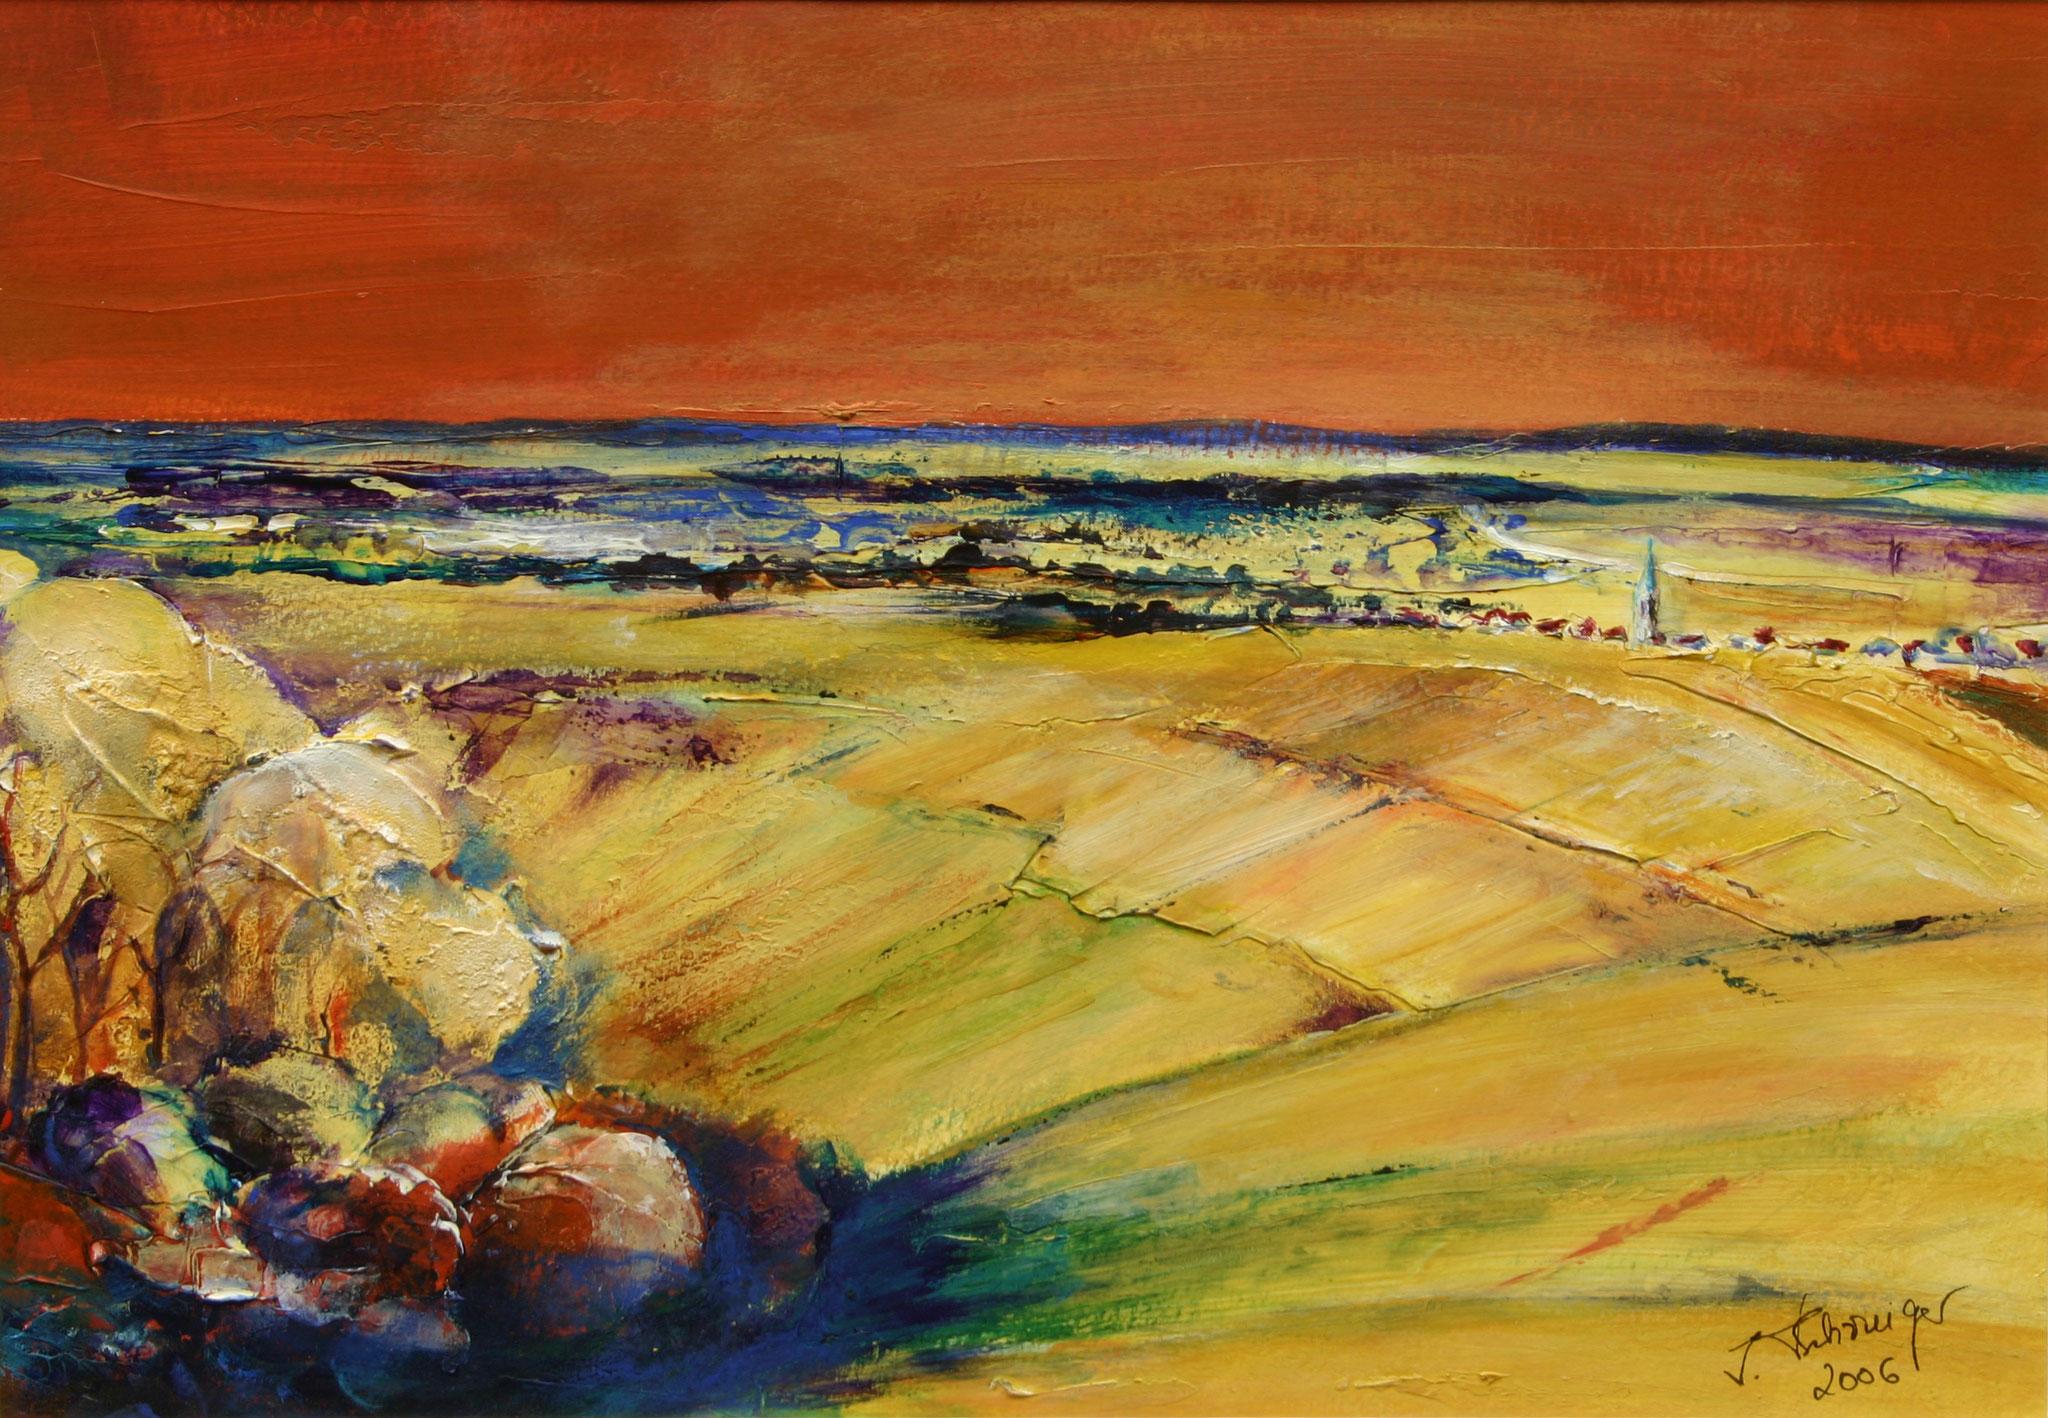 Fernblick, Acryl, 25 x 40 cm